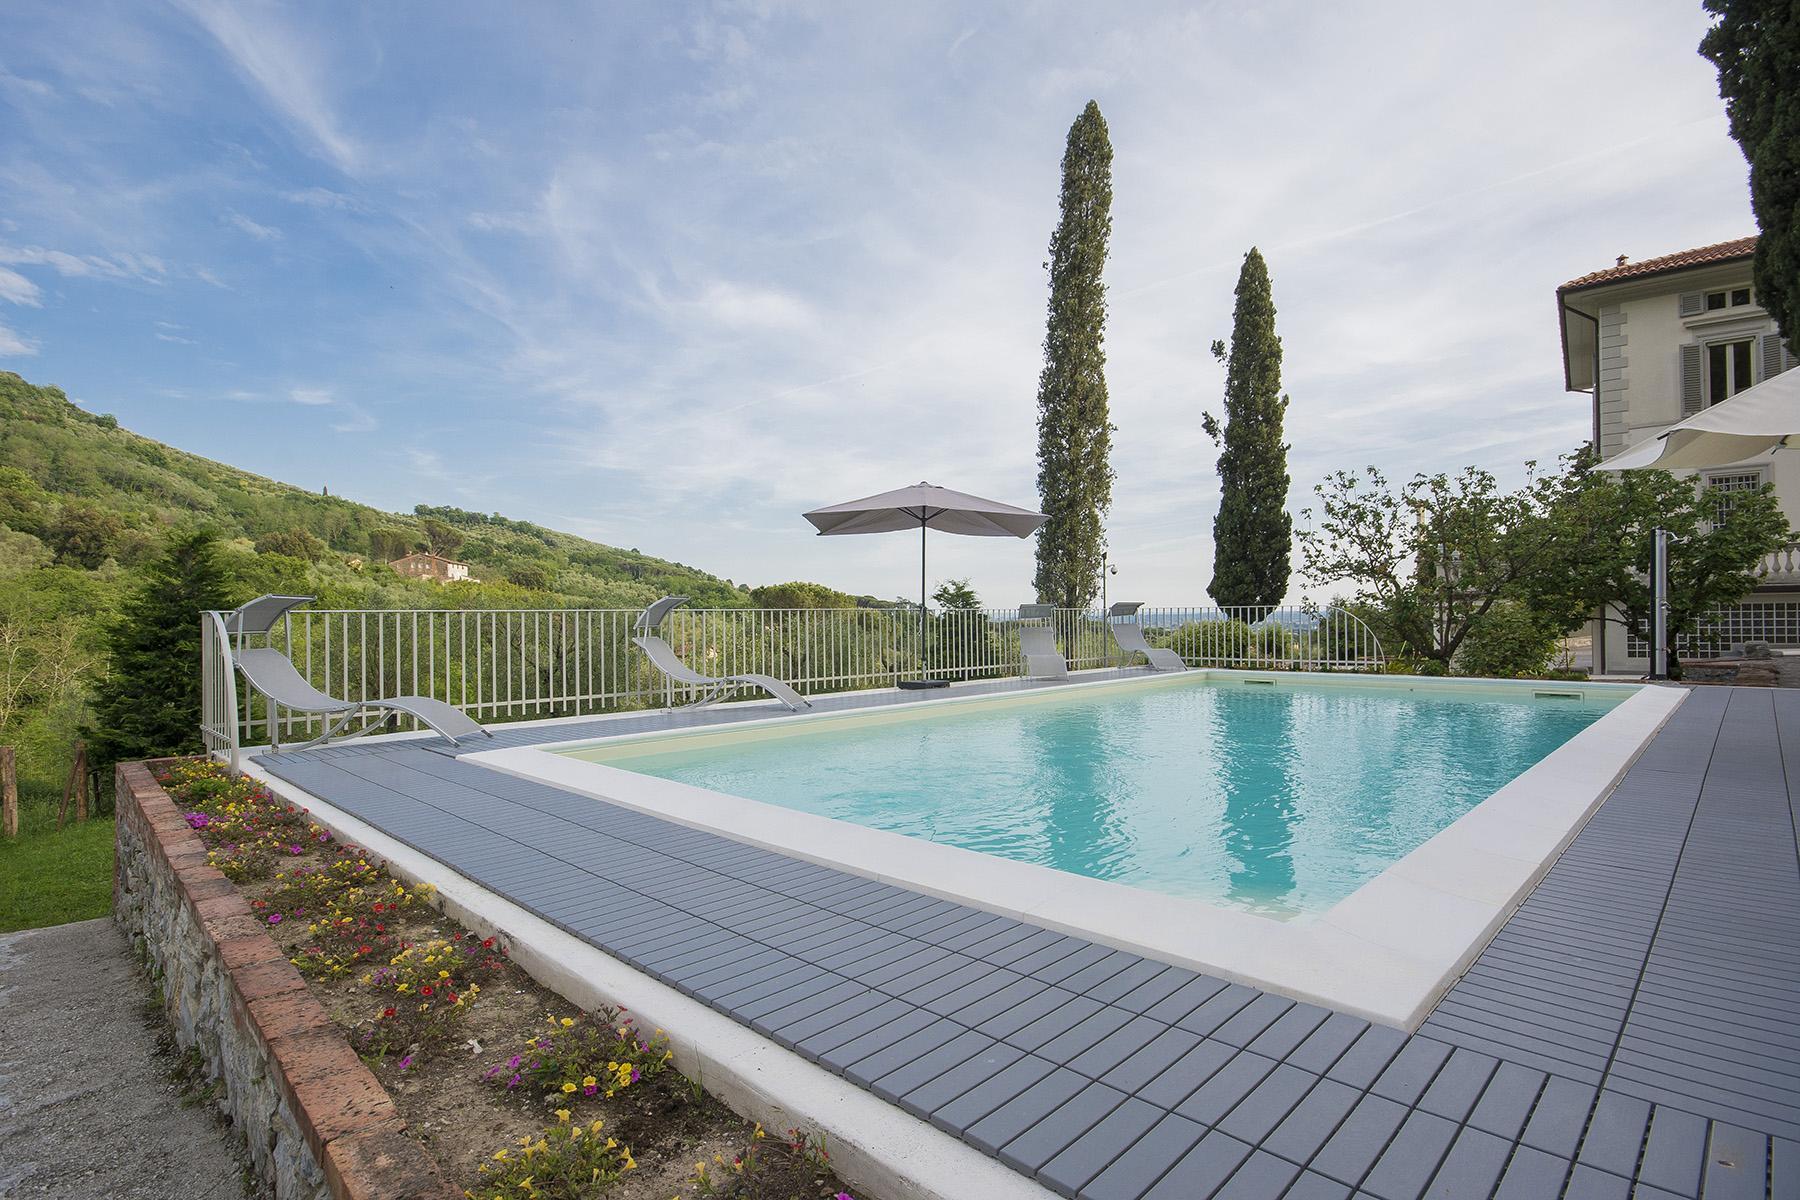 Montecatini Terme小镇优雅的新艺术风格的别墅 - 32